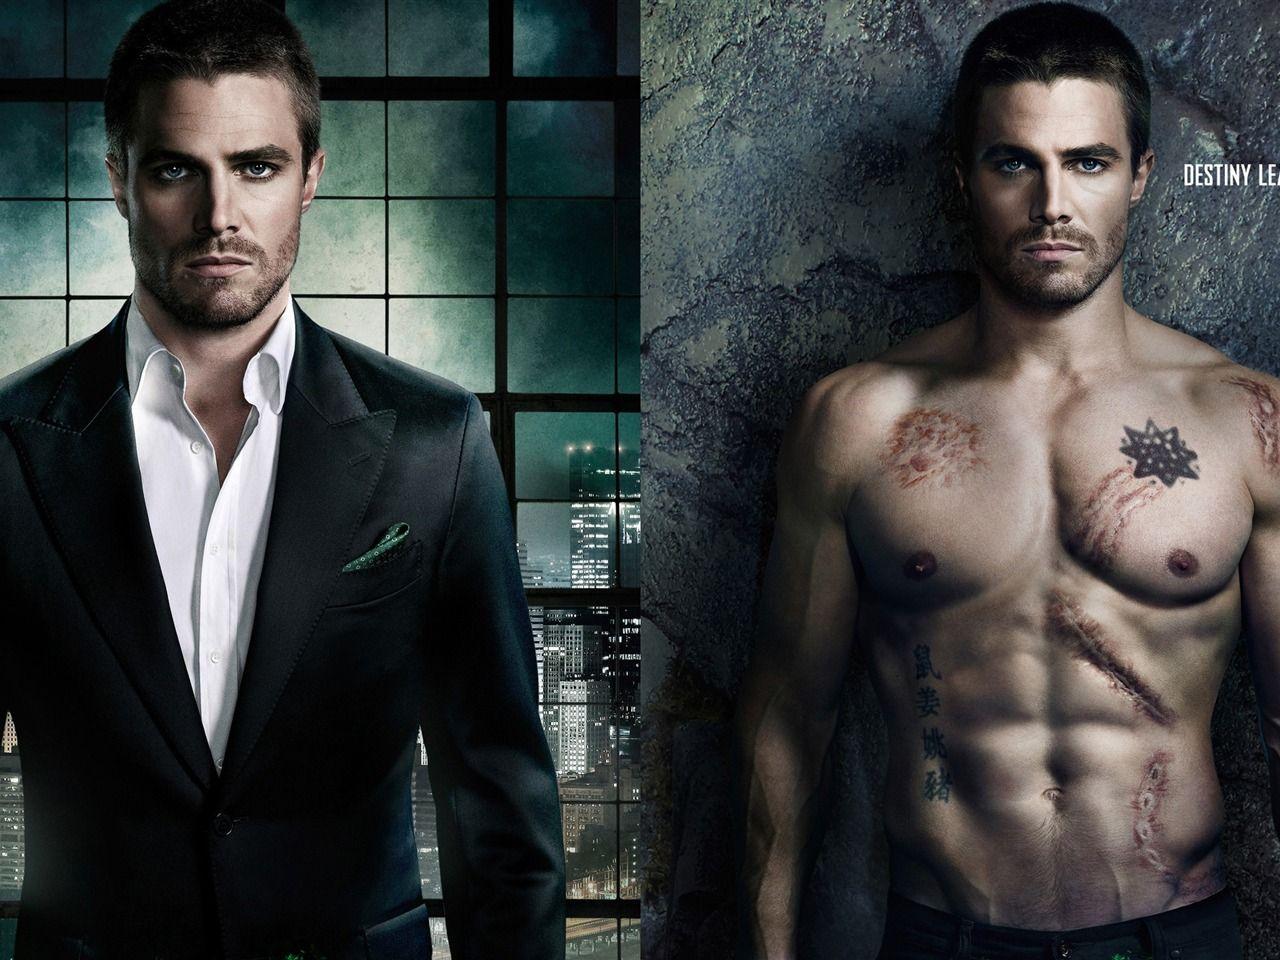 Arrow TV Show | Arrow 2012 TV series HD Wallpapers 09 - 1280x960 wallpaper download ...